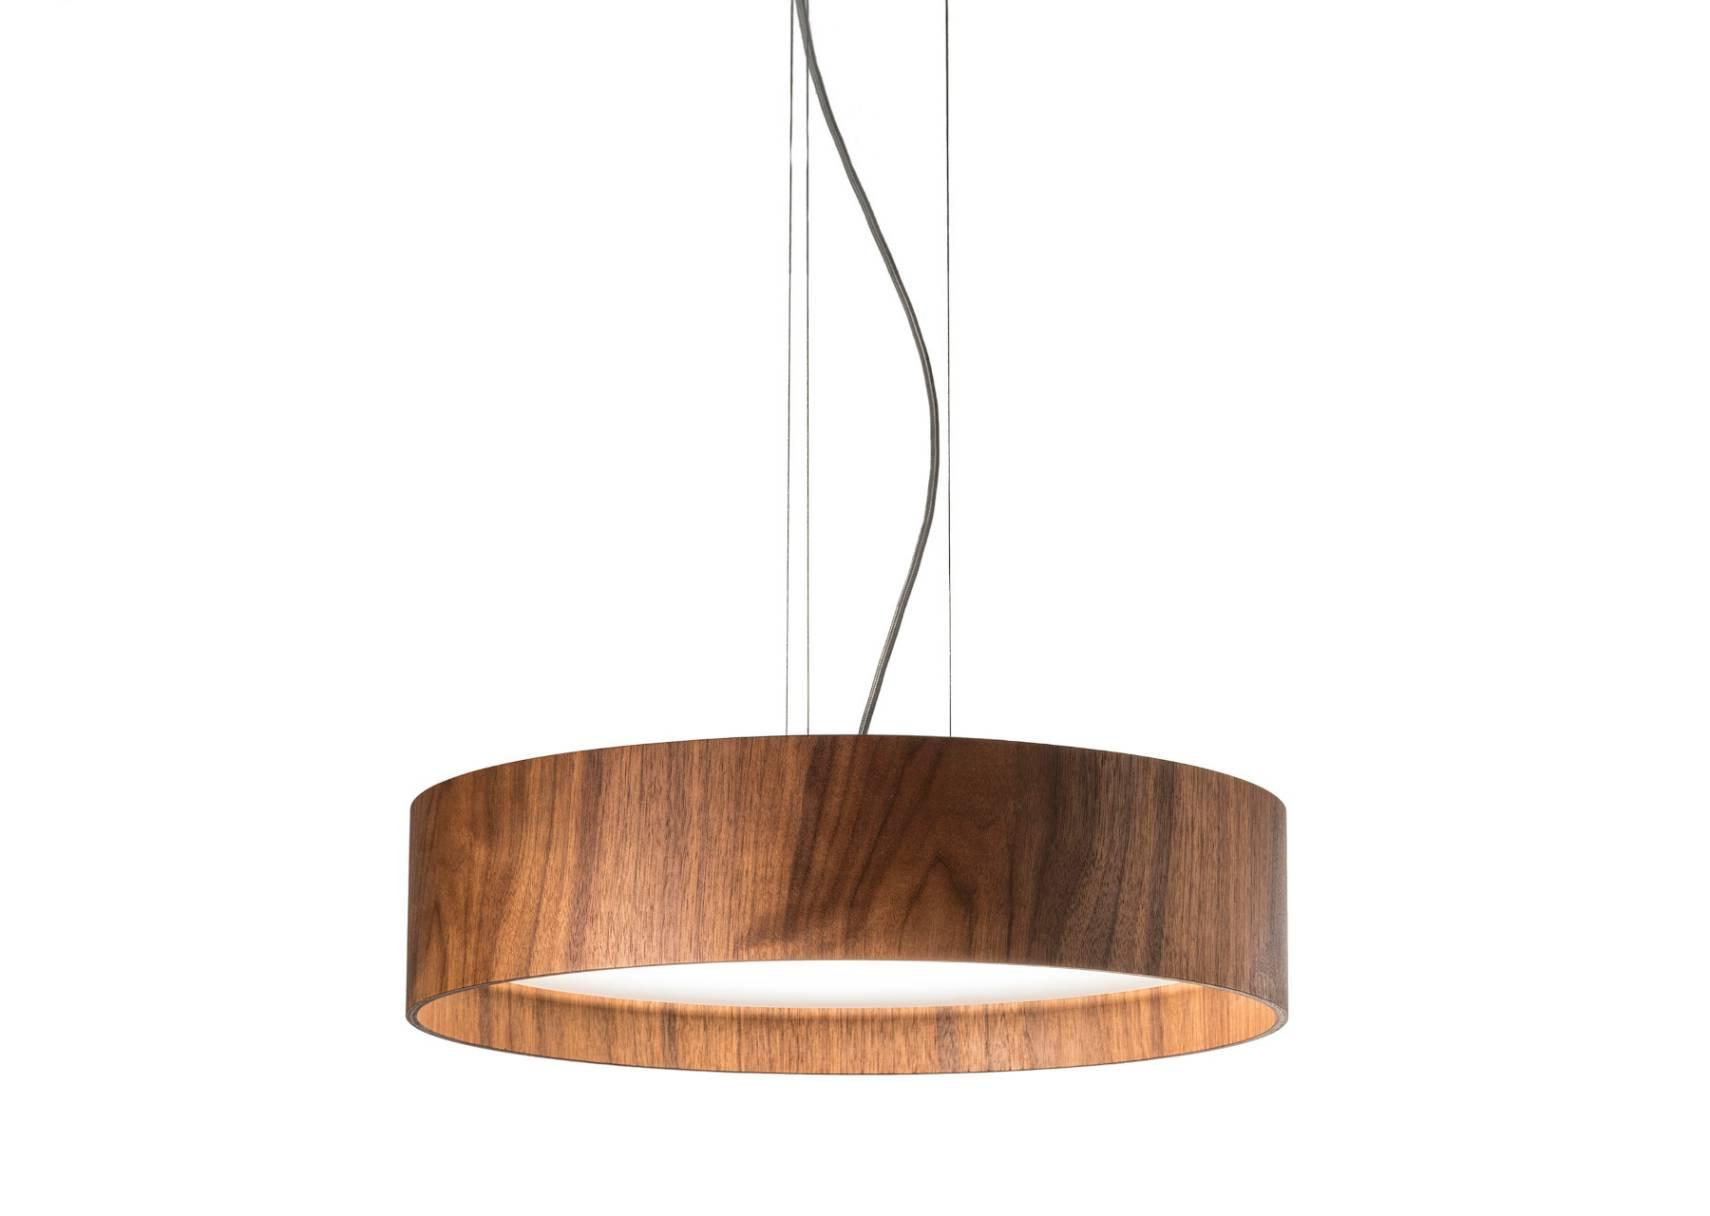 Domus Larawood LED Pendelleuchte Design Leuchte